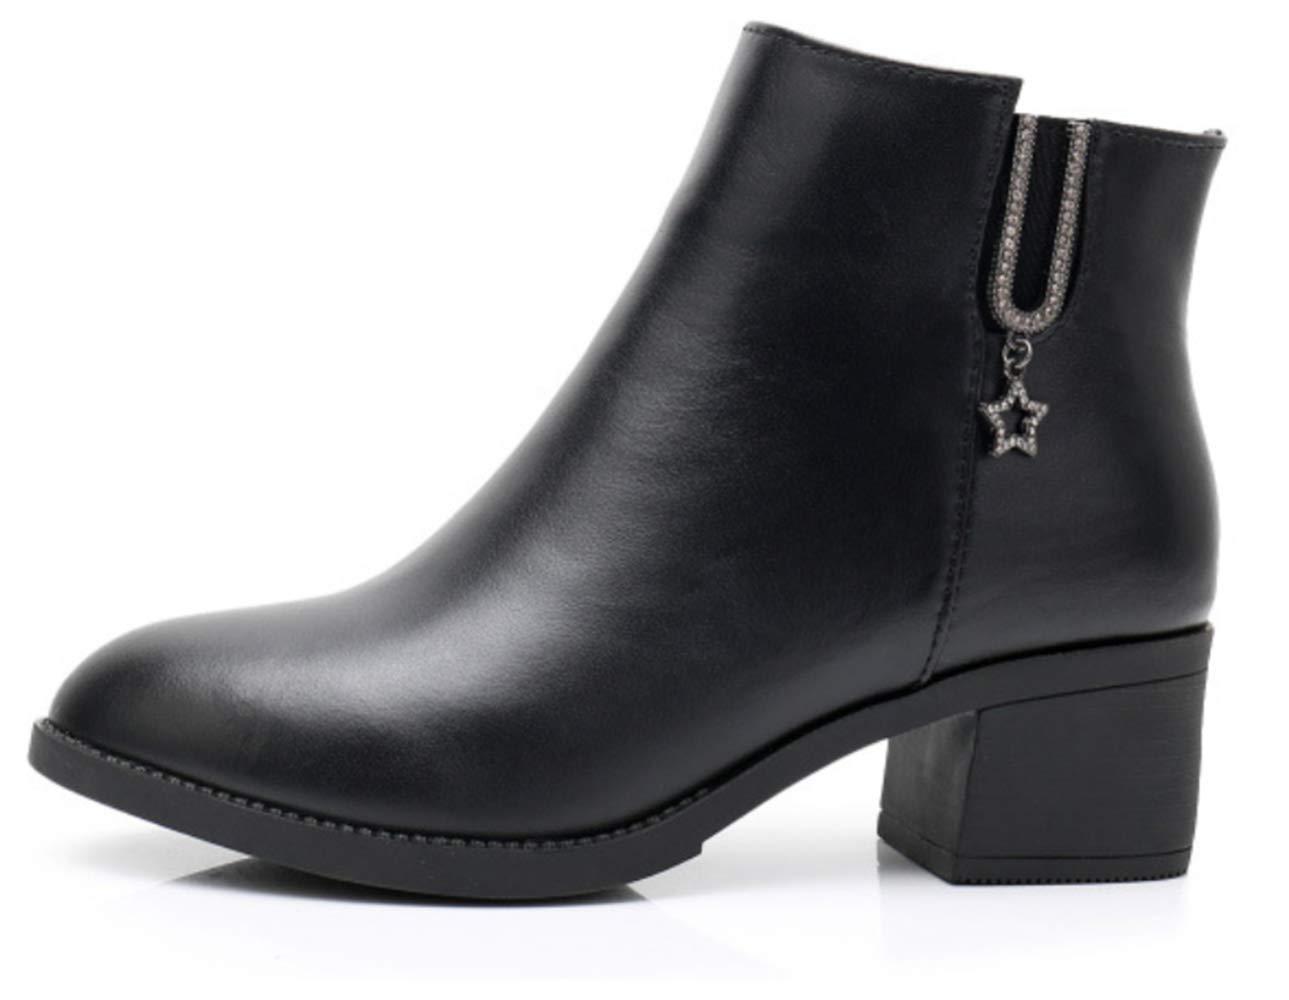 Shiney Damen Damen Damen Leder Chelsea Stiefelies Weibliche Chunky Ferse Slip Plus Samt Warme Nackte Stiefel Herbst Winter 8a3922